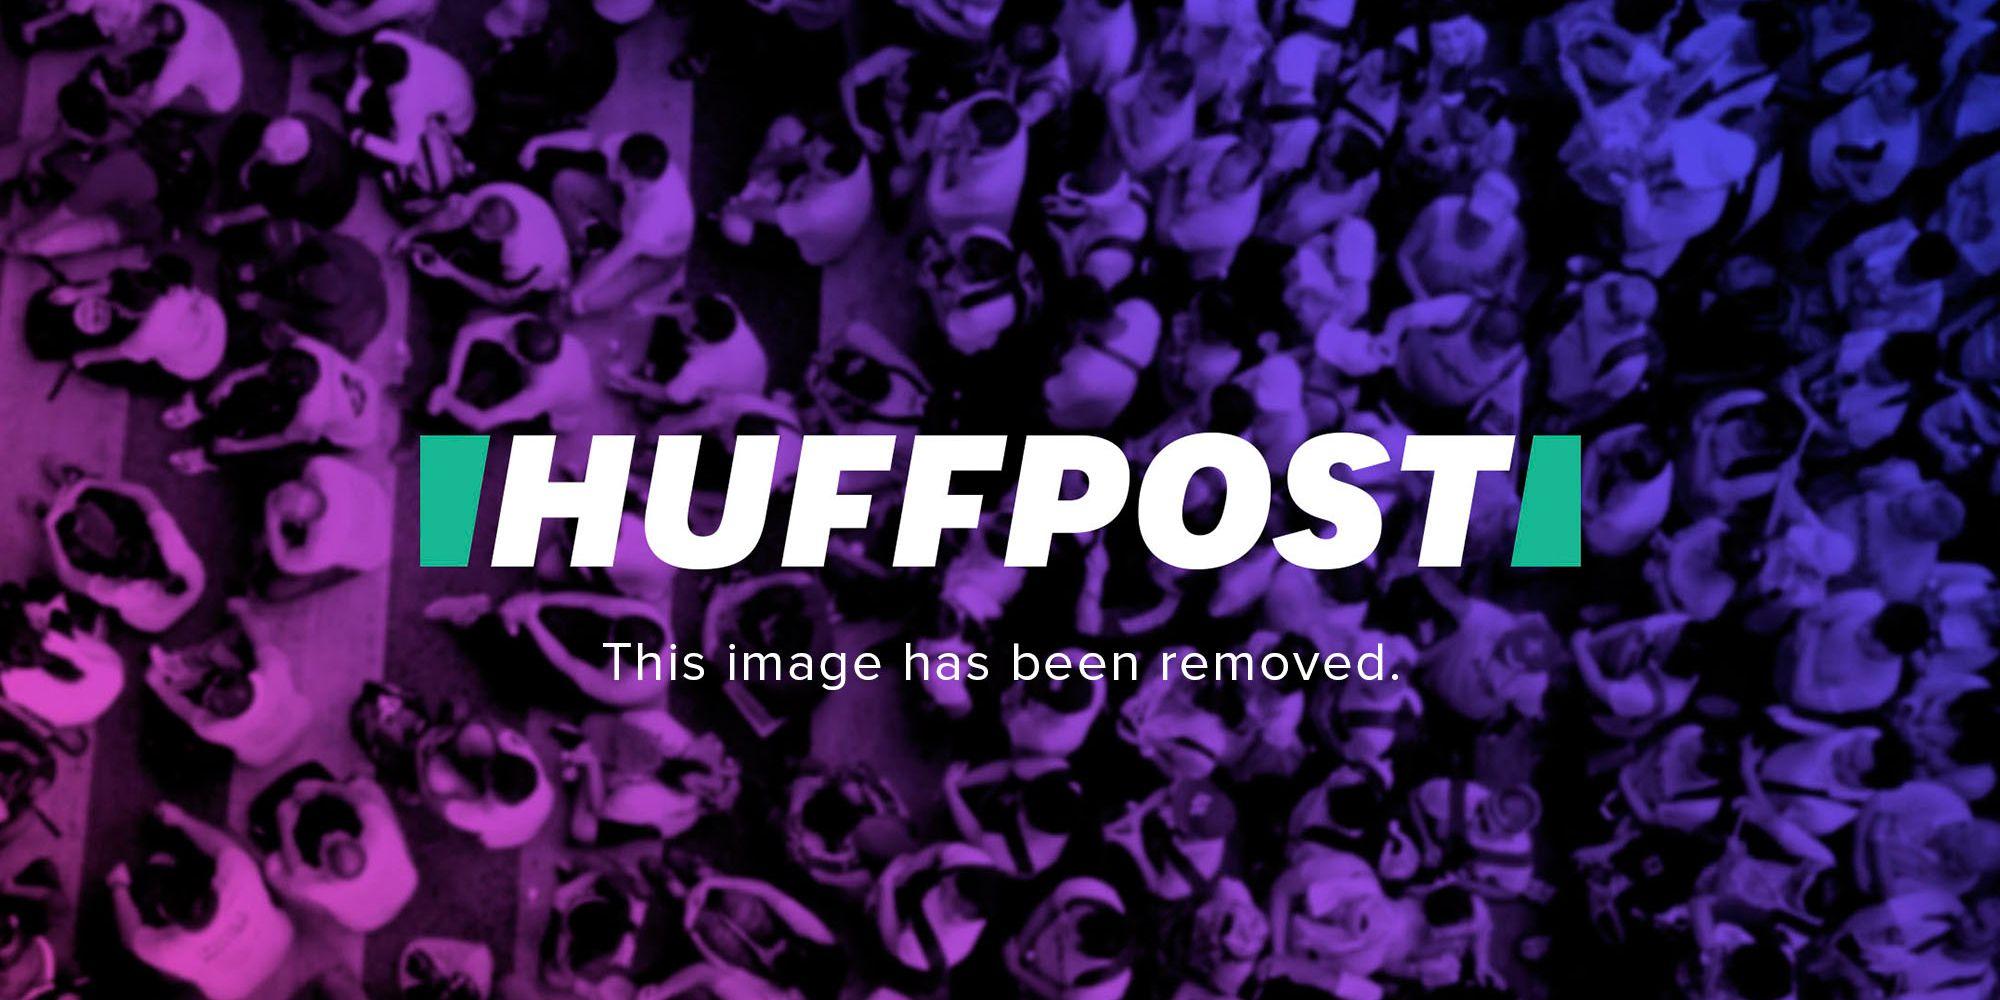 http://img.huffingtonpost.com/asset/2000_1000/5639421f1800002b00303c15.jpeg?cache=wavuk3xtfn